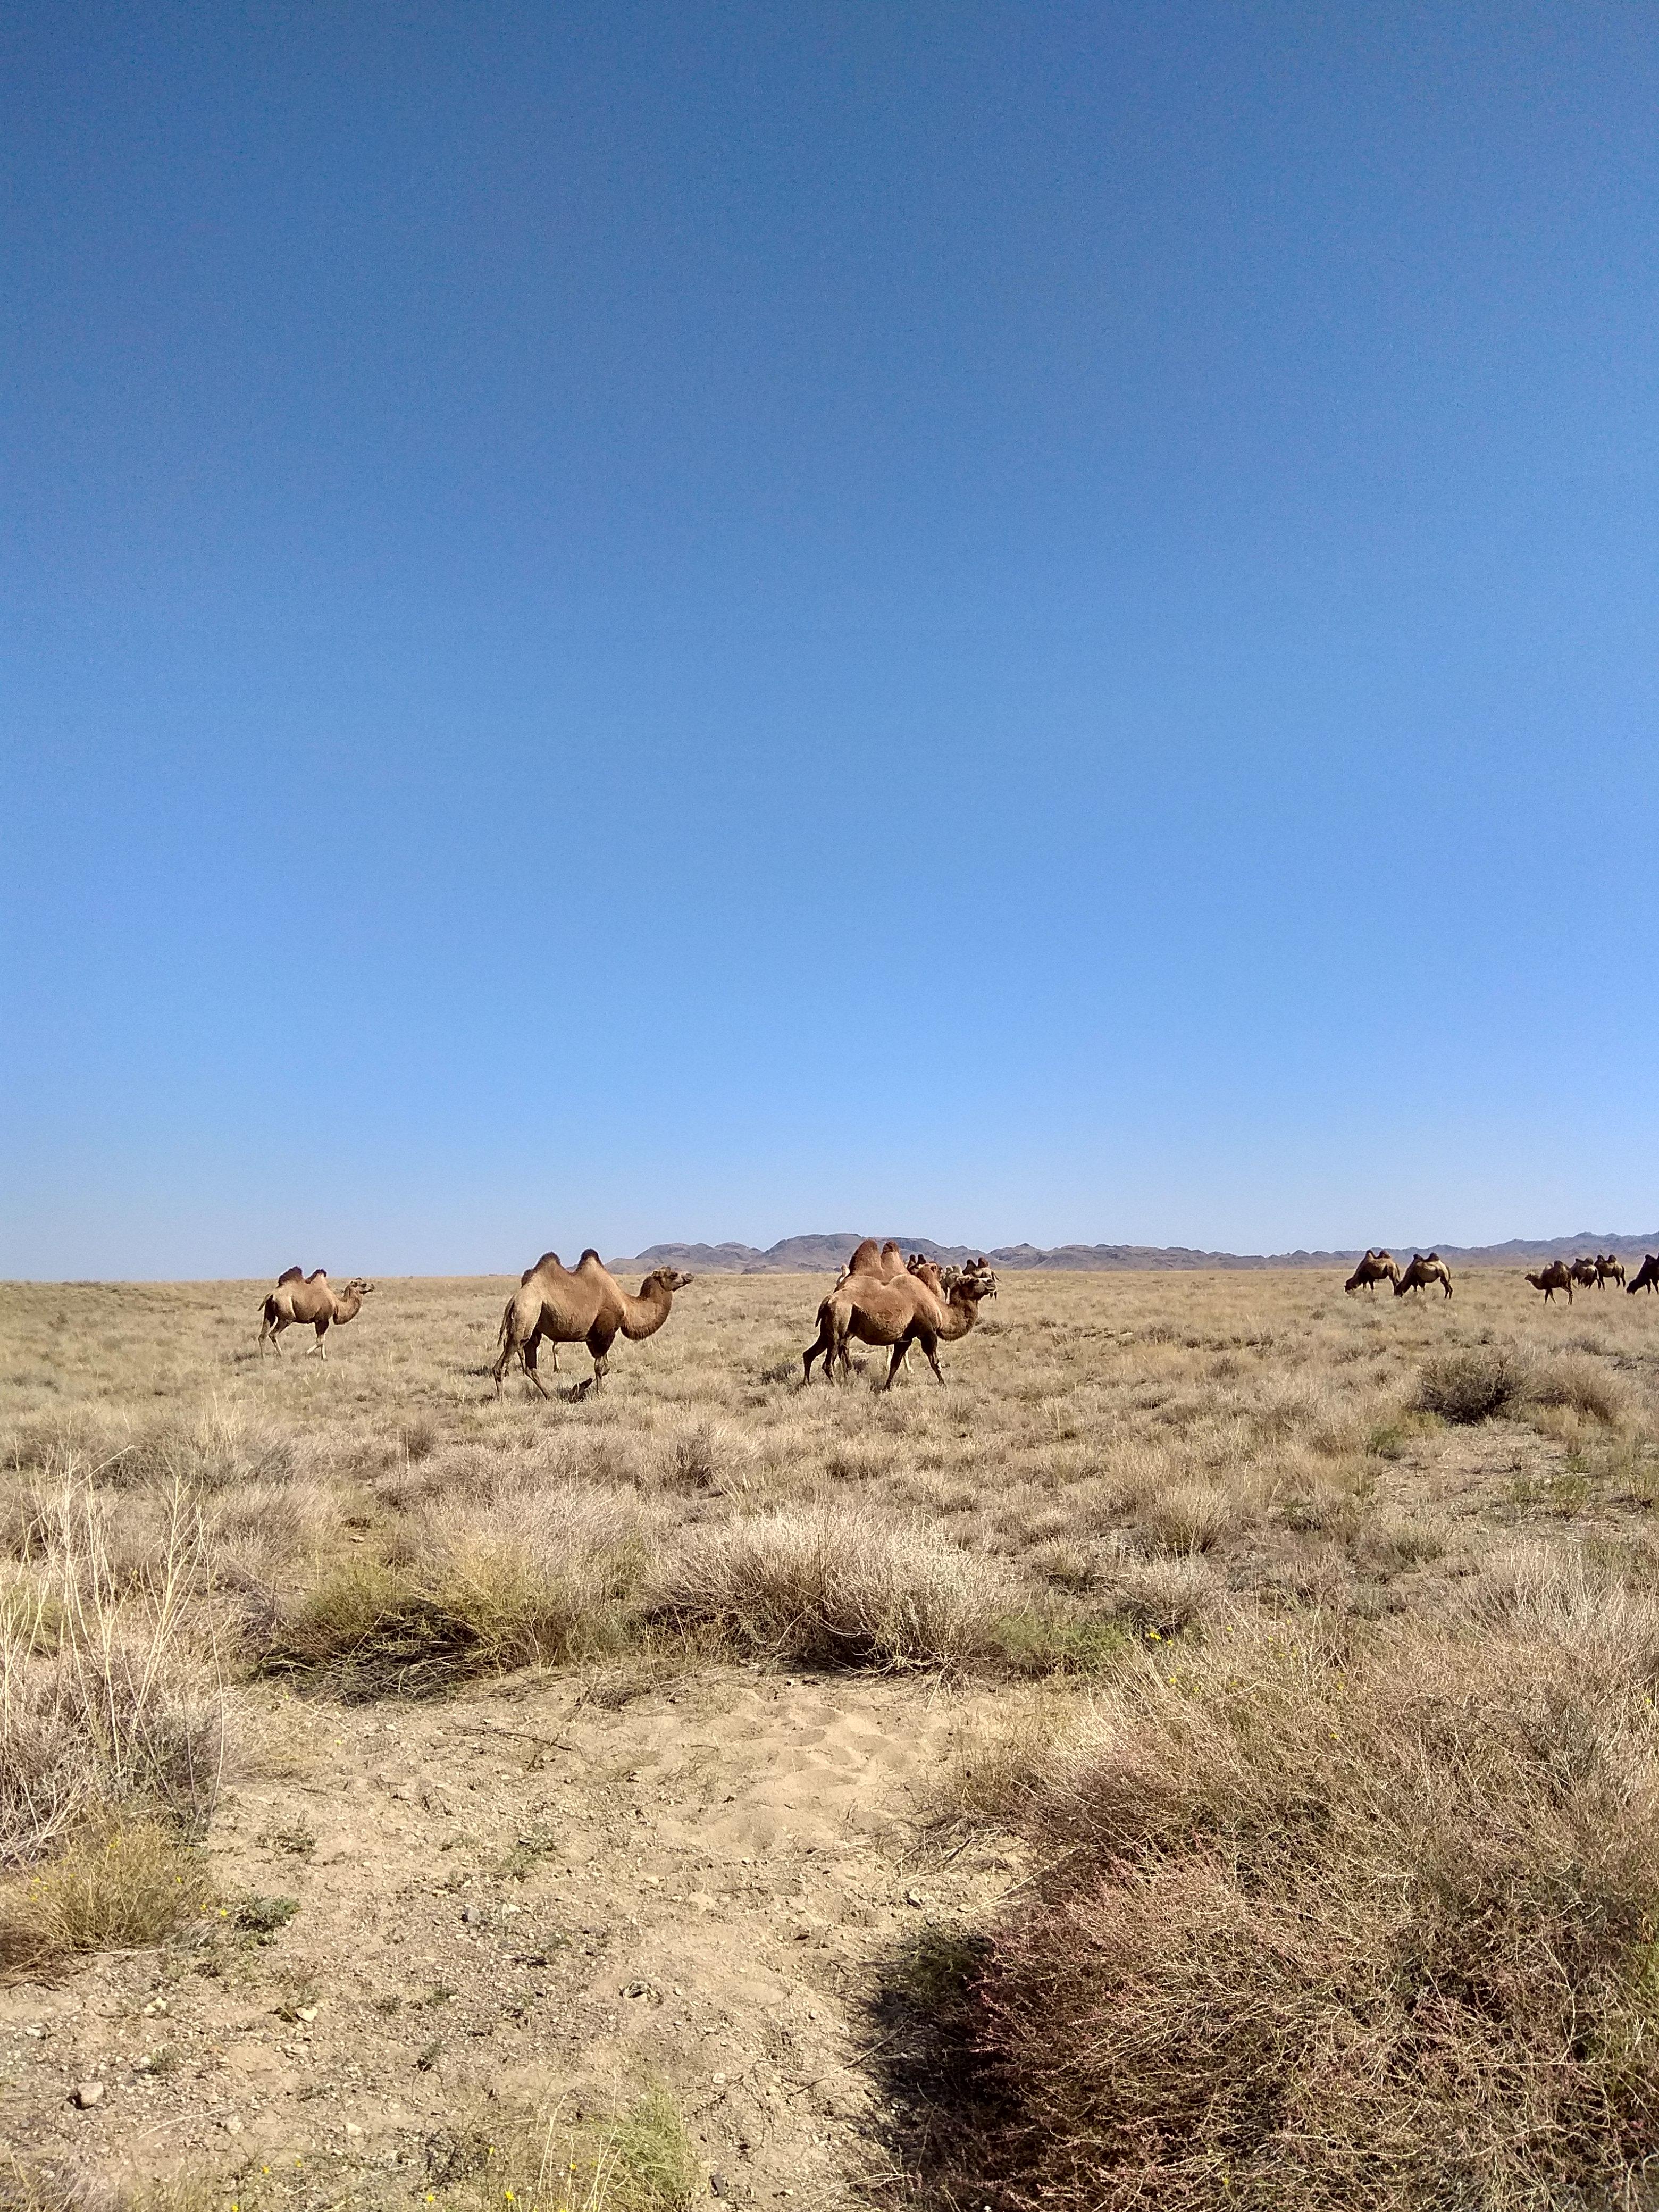 Camels in Altyn Emel National Park, Kazakhstan